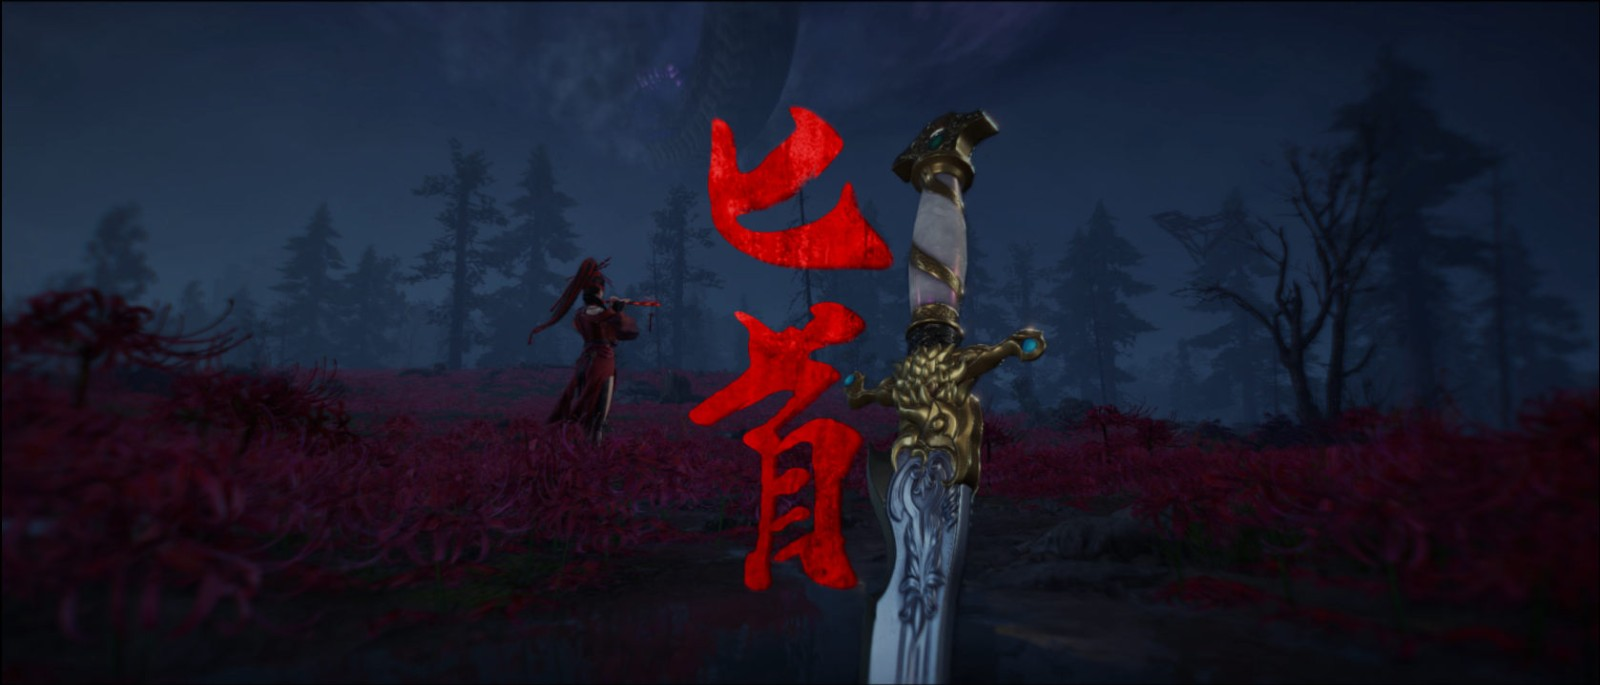 F5联合发布会:《永劫无间》PS5版本确认开发中 新赛季内容曝光